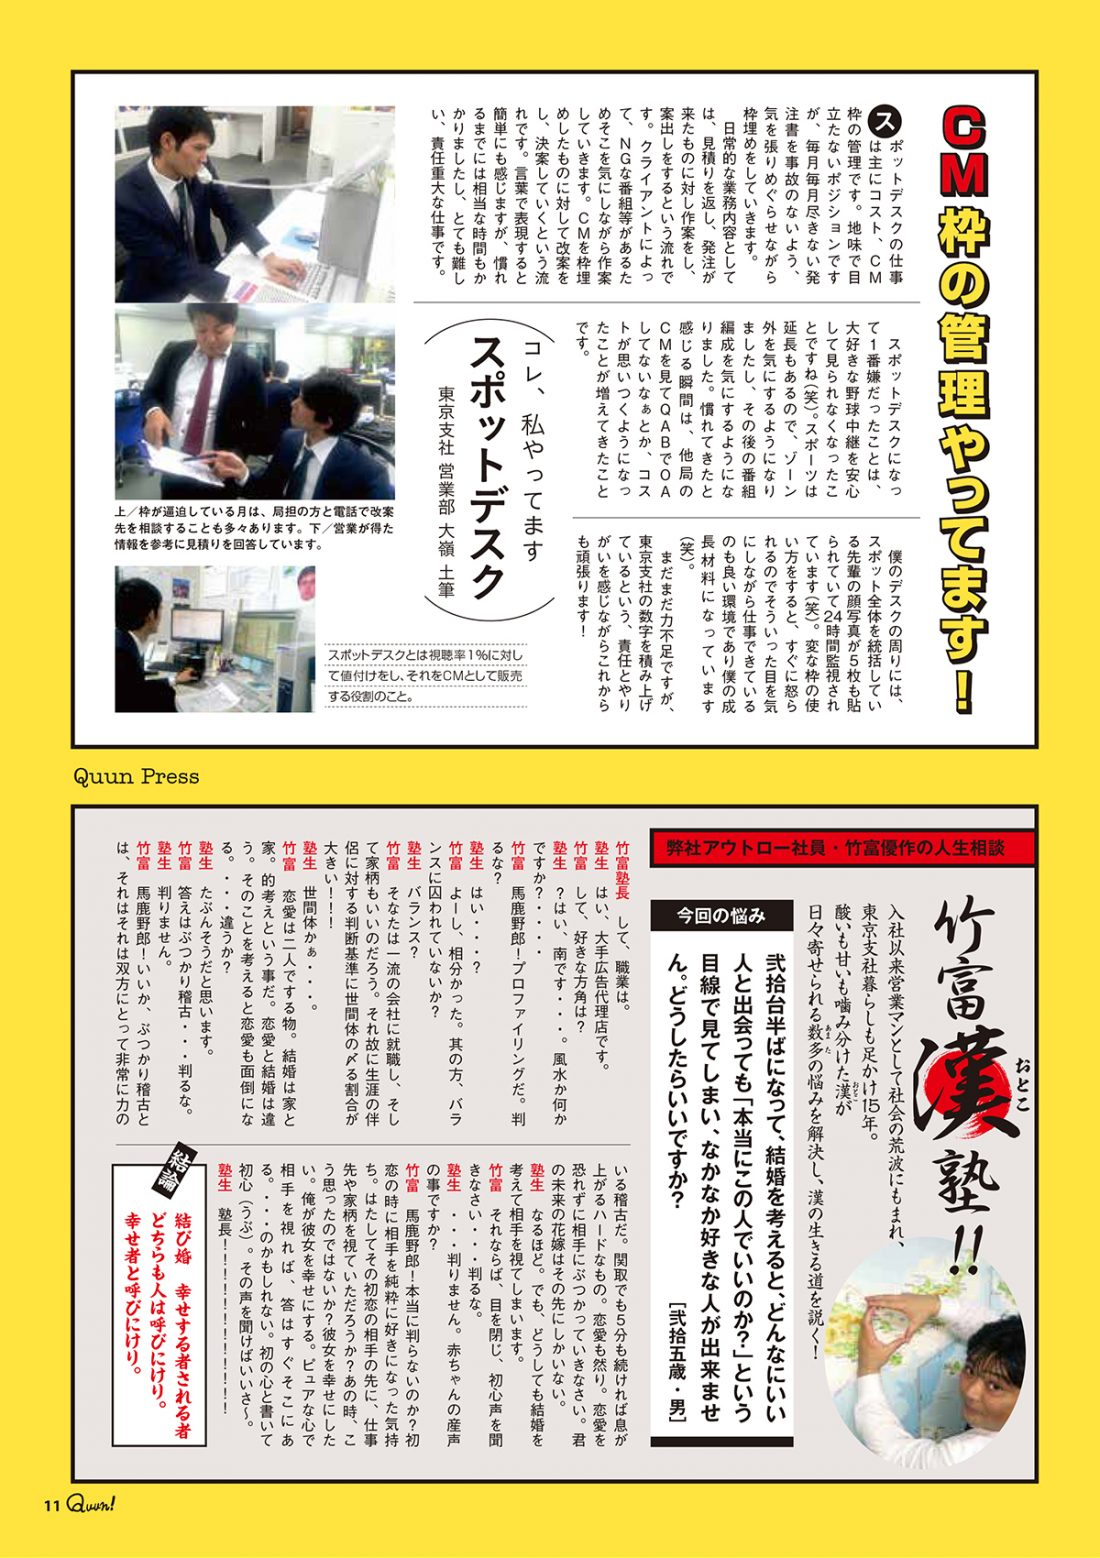 https://www.qab.co.jp/qgoro/wp-content/uploads/quun_0713-1100x1558.jpg